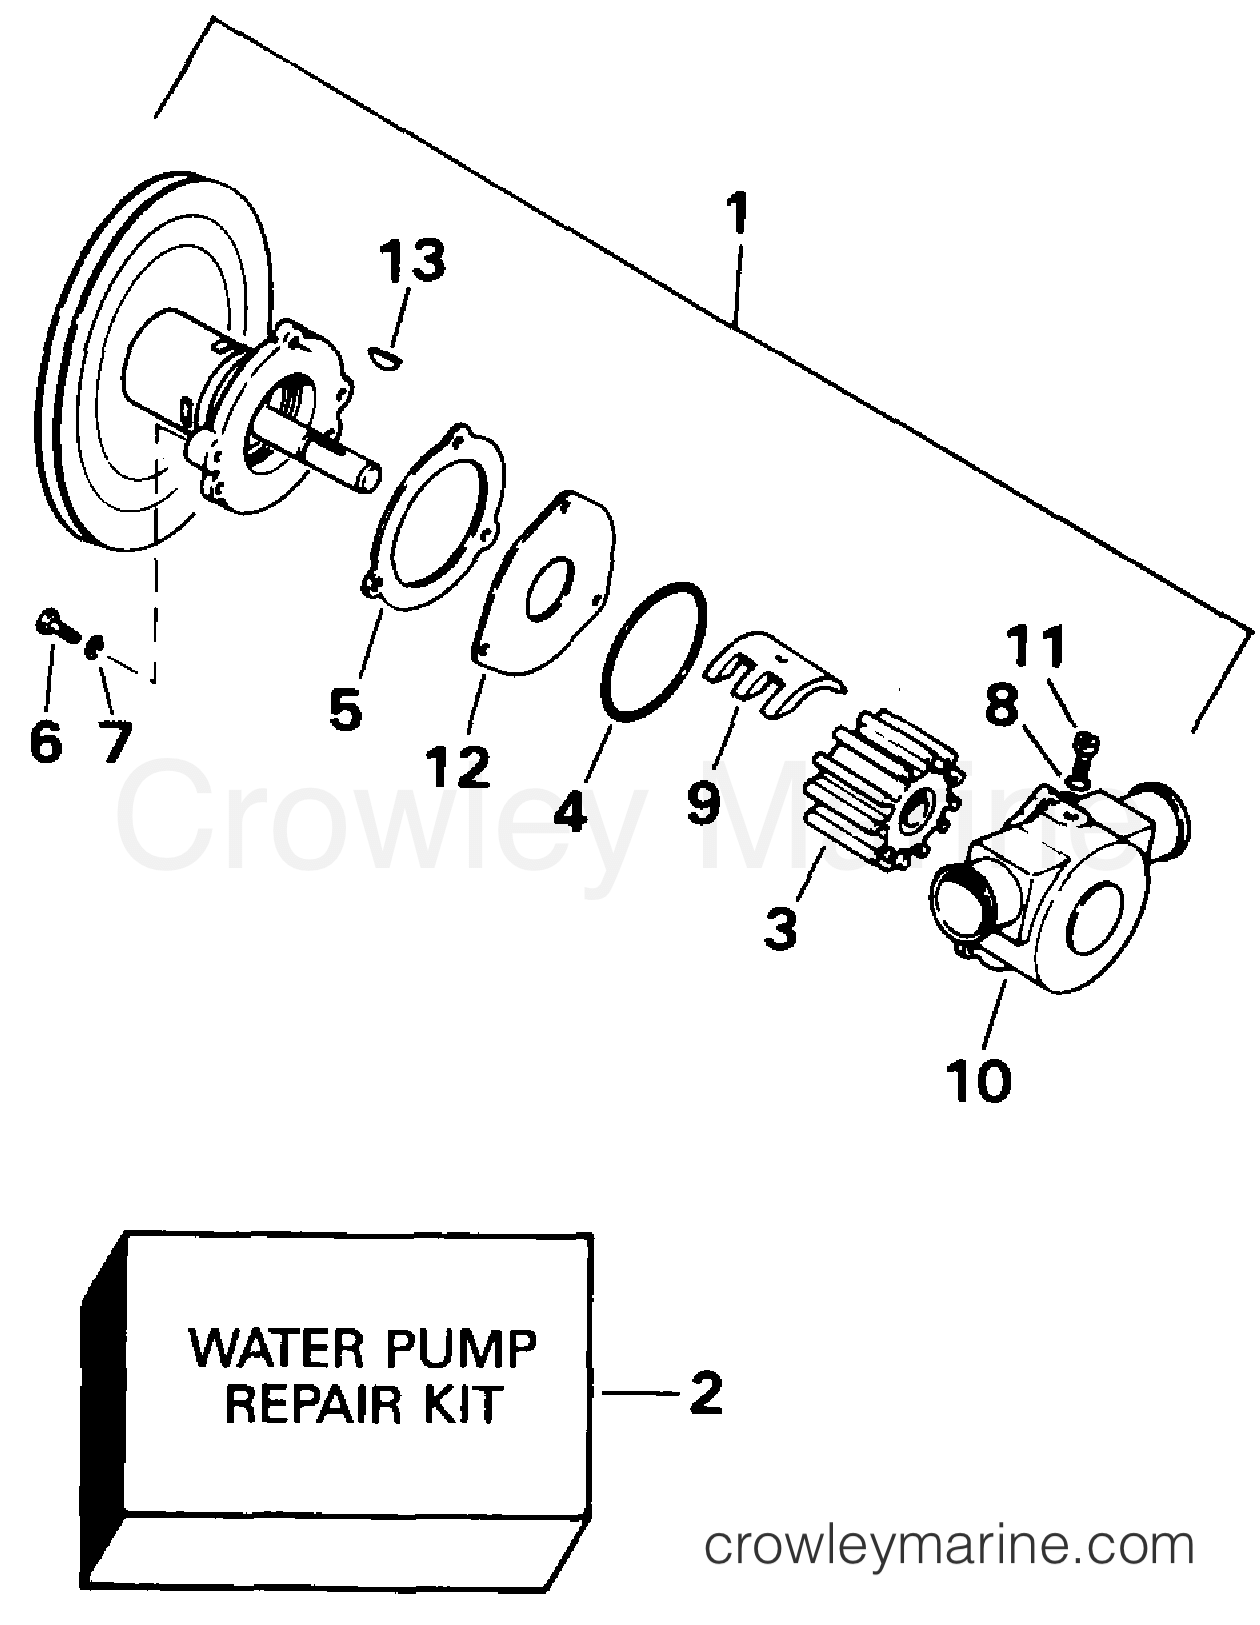 Omc Water Pump Diagram Wiring Harness Adapter Stern Drive Ccpmda Crowley Marine 1260x1625